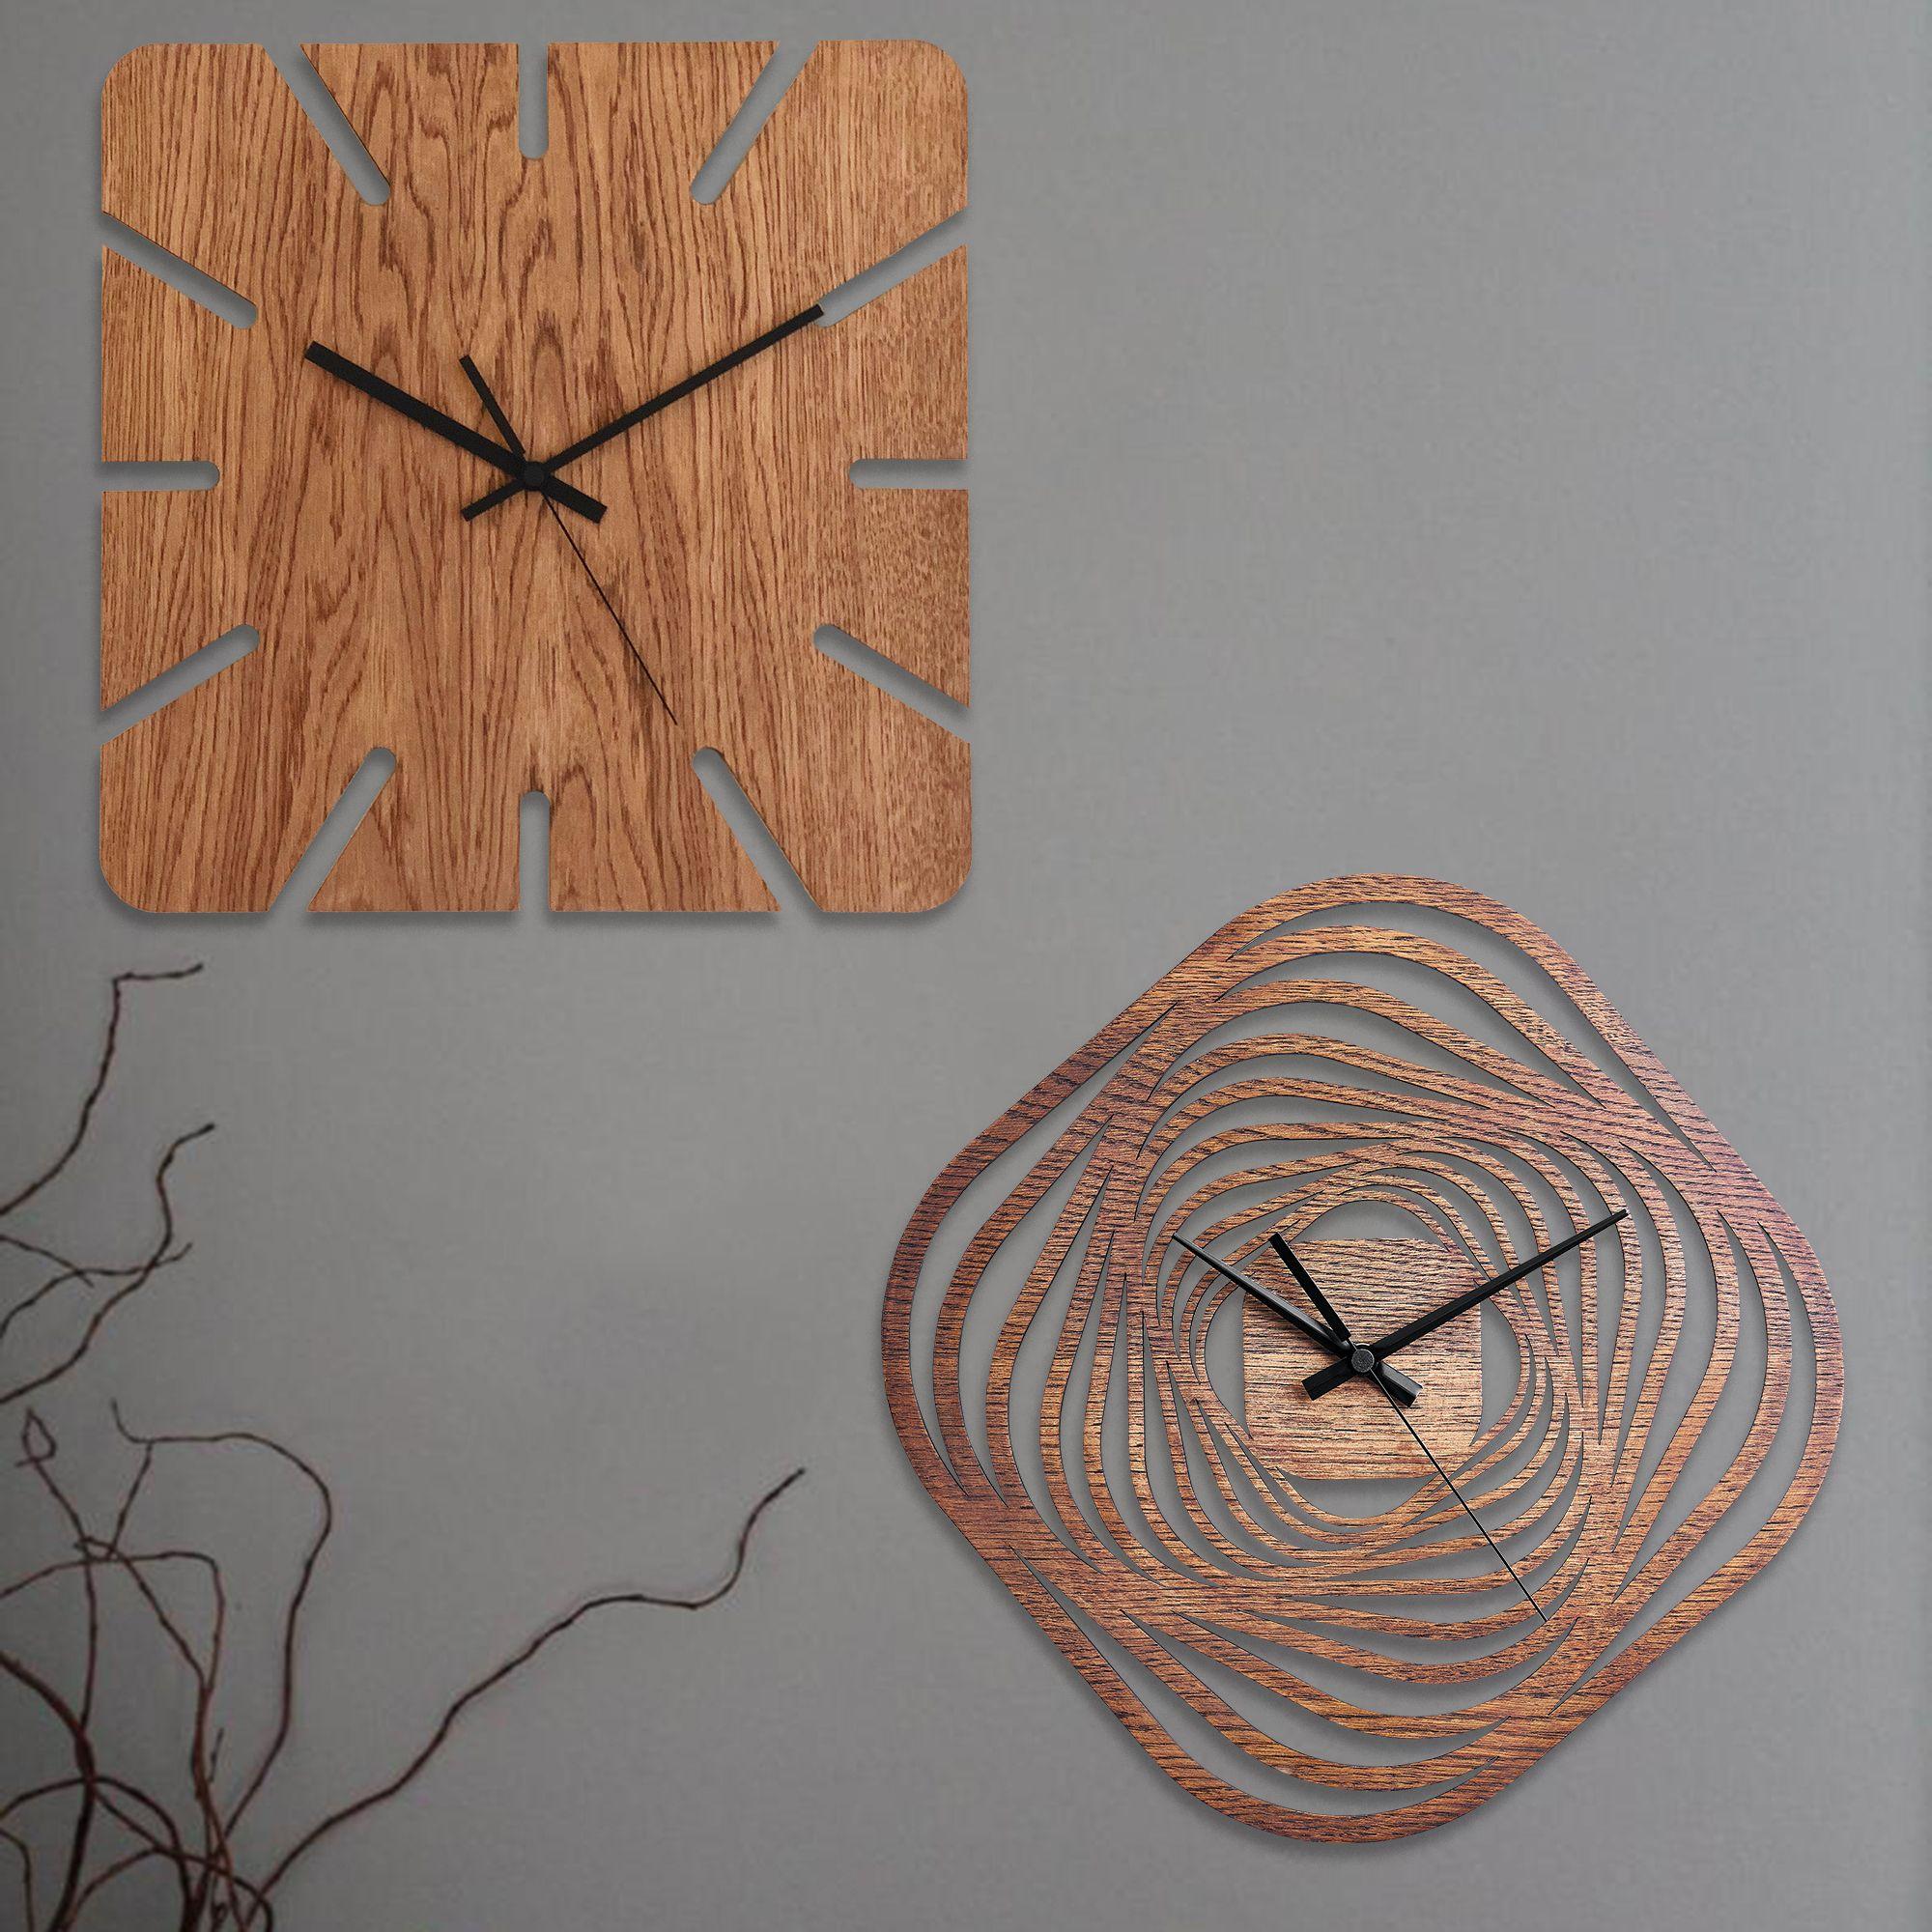 Wooden Wall Clocks Moku Design Wall Clock Wooden Wall Clock Modern Wooden Clock